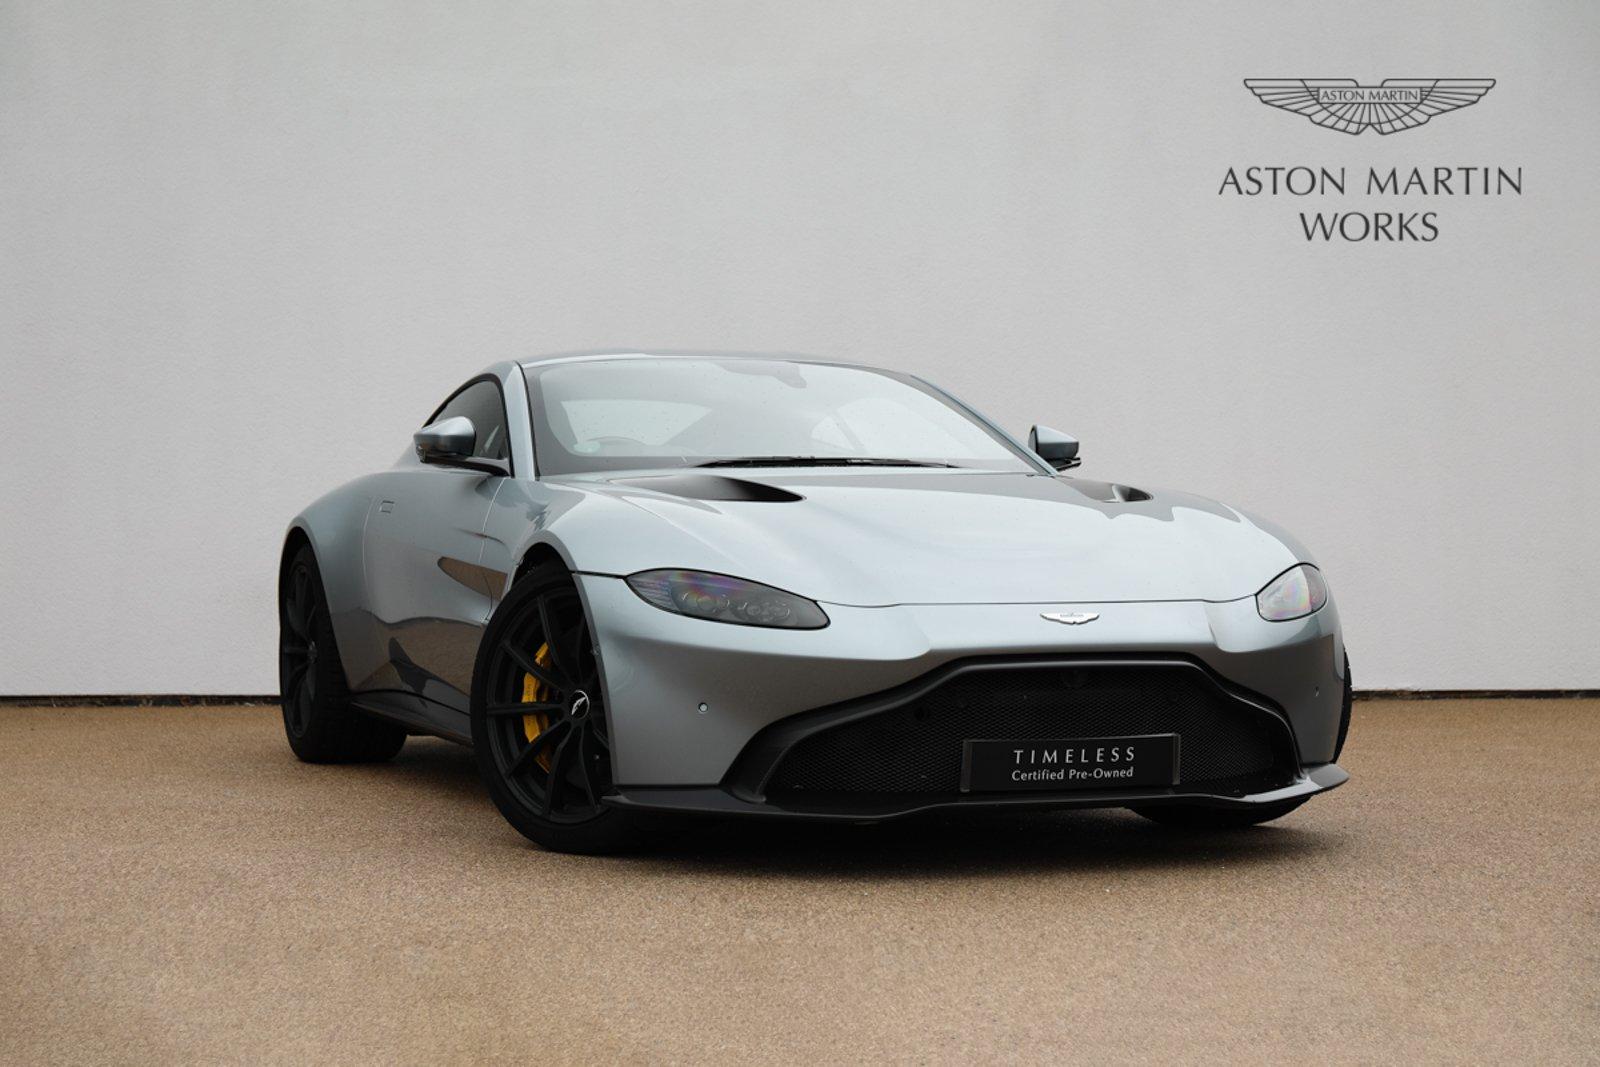 2018 Aston Martin V8 Vantage Ceo Edition 1 Of 6 Classic Driver Market